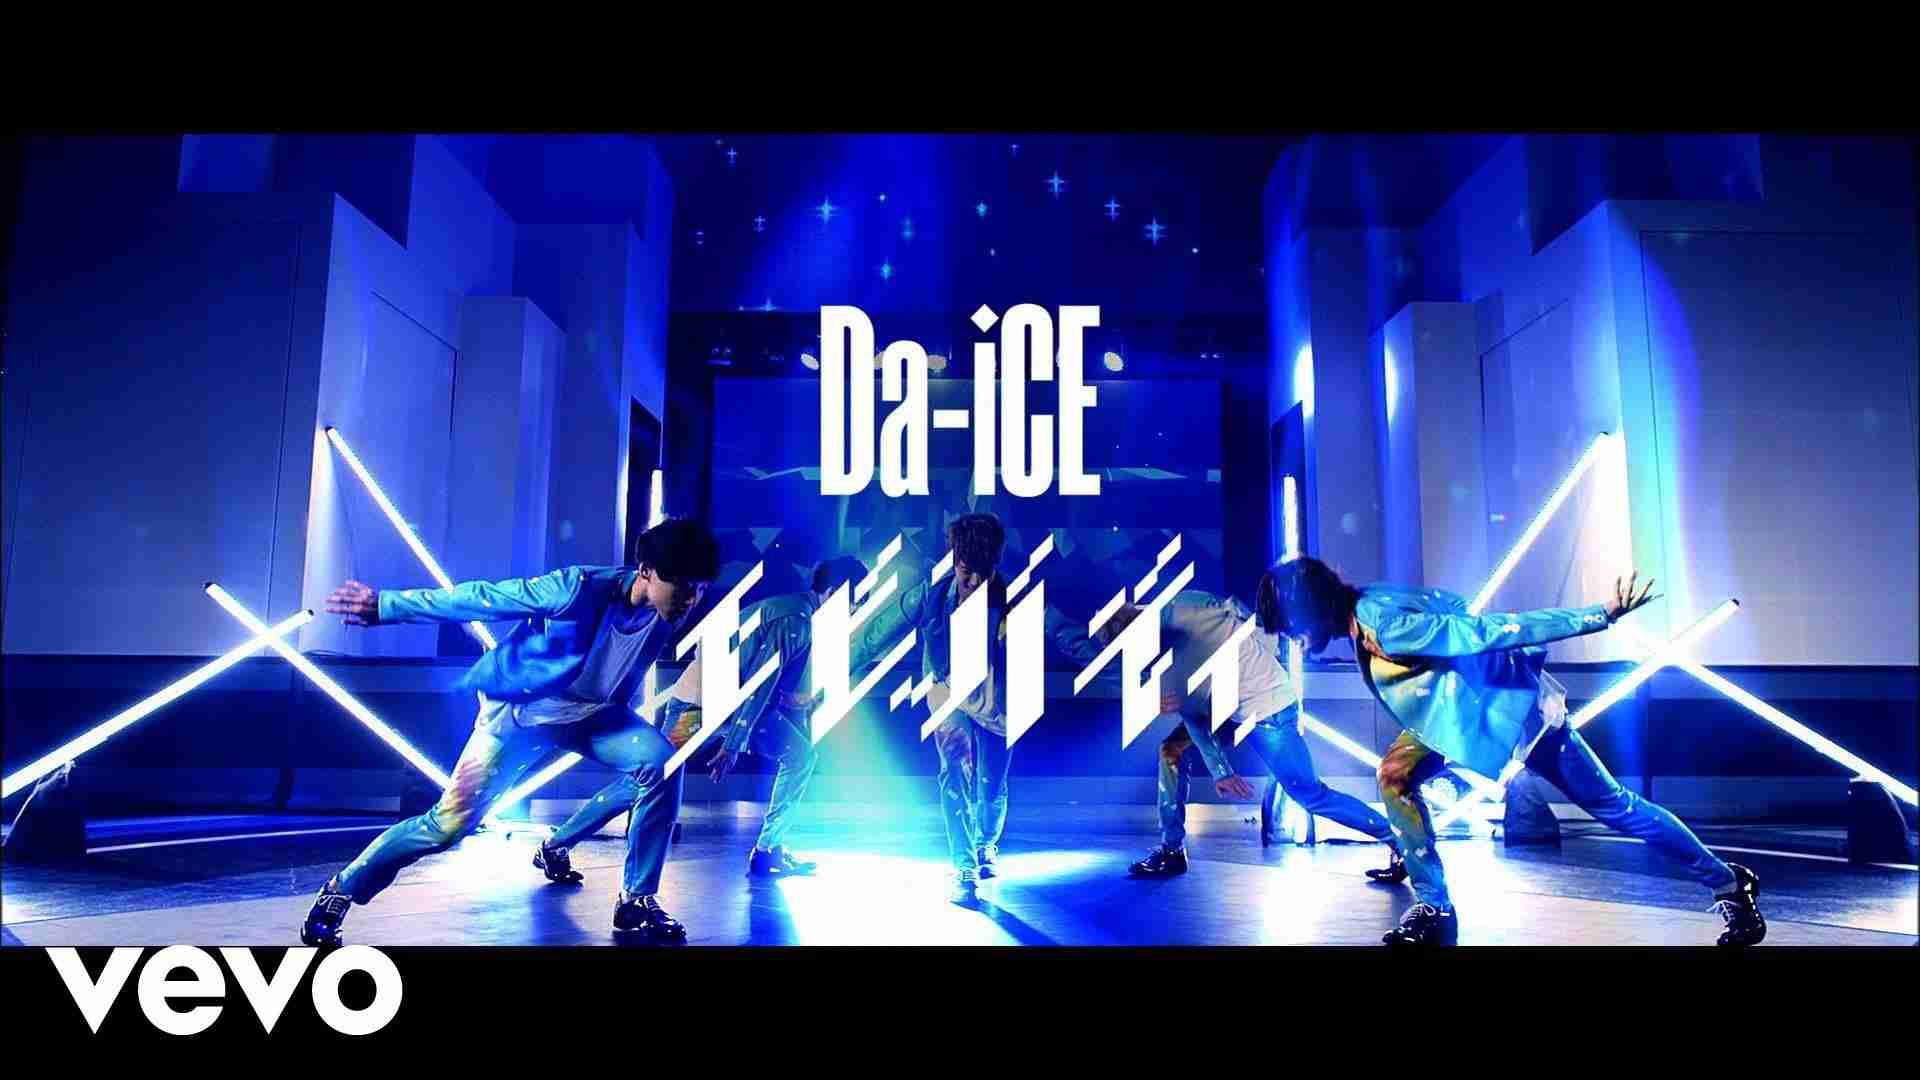 Da-iCE(ダイス) - 6th single「エビバディ」Music Video 【Full ver.】 [2015.8.12(水)Release] - YouTube